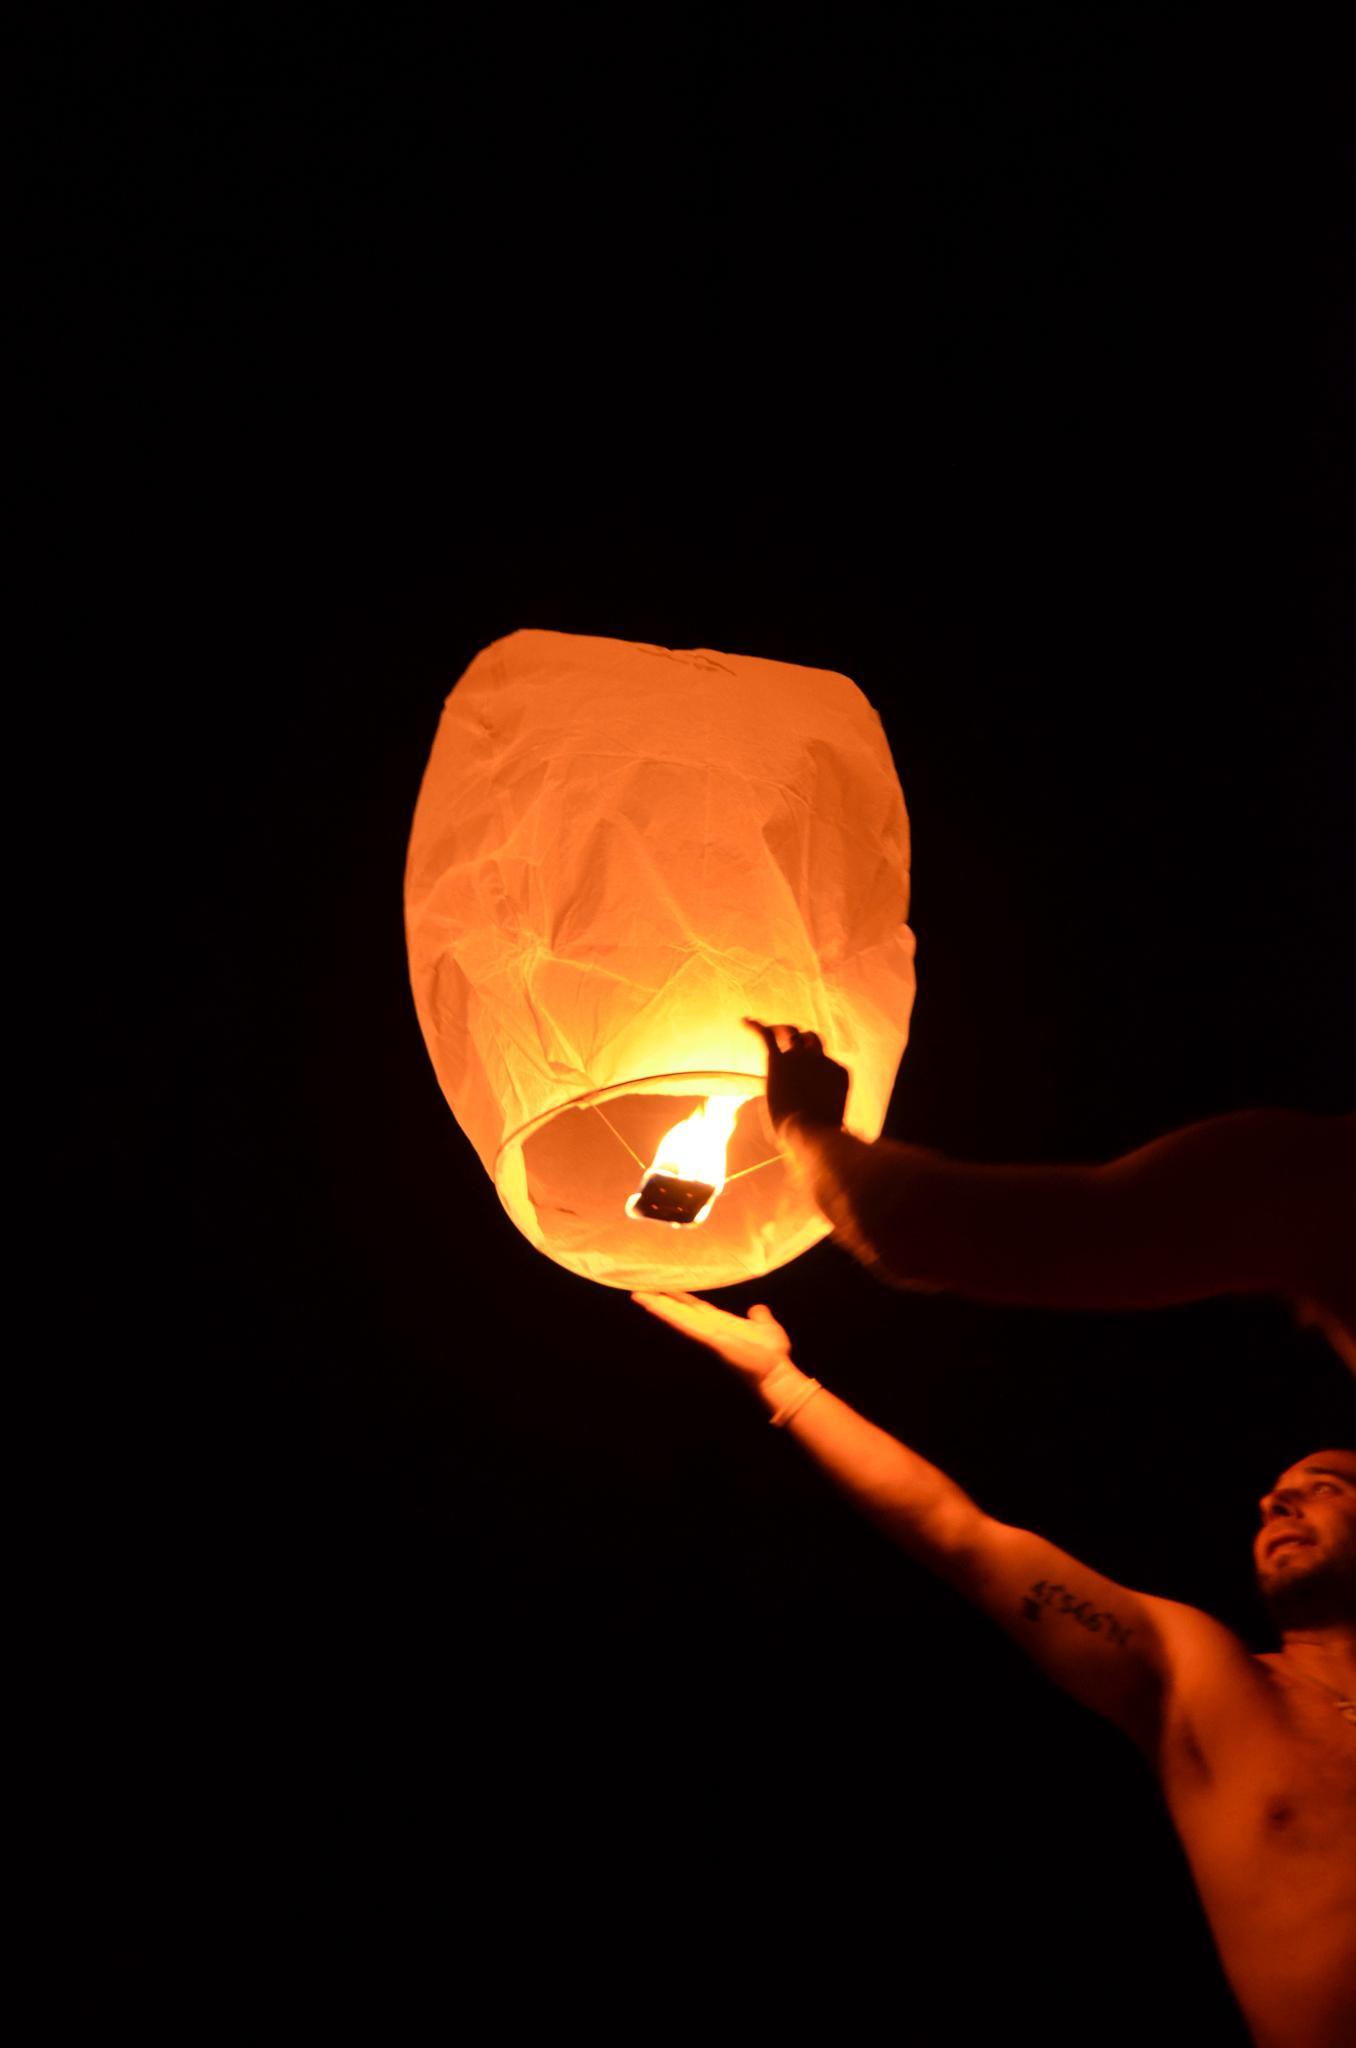 Lighting up the night by rkraus3171974